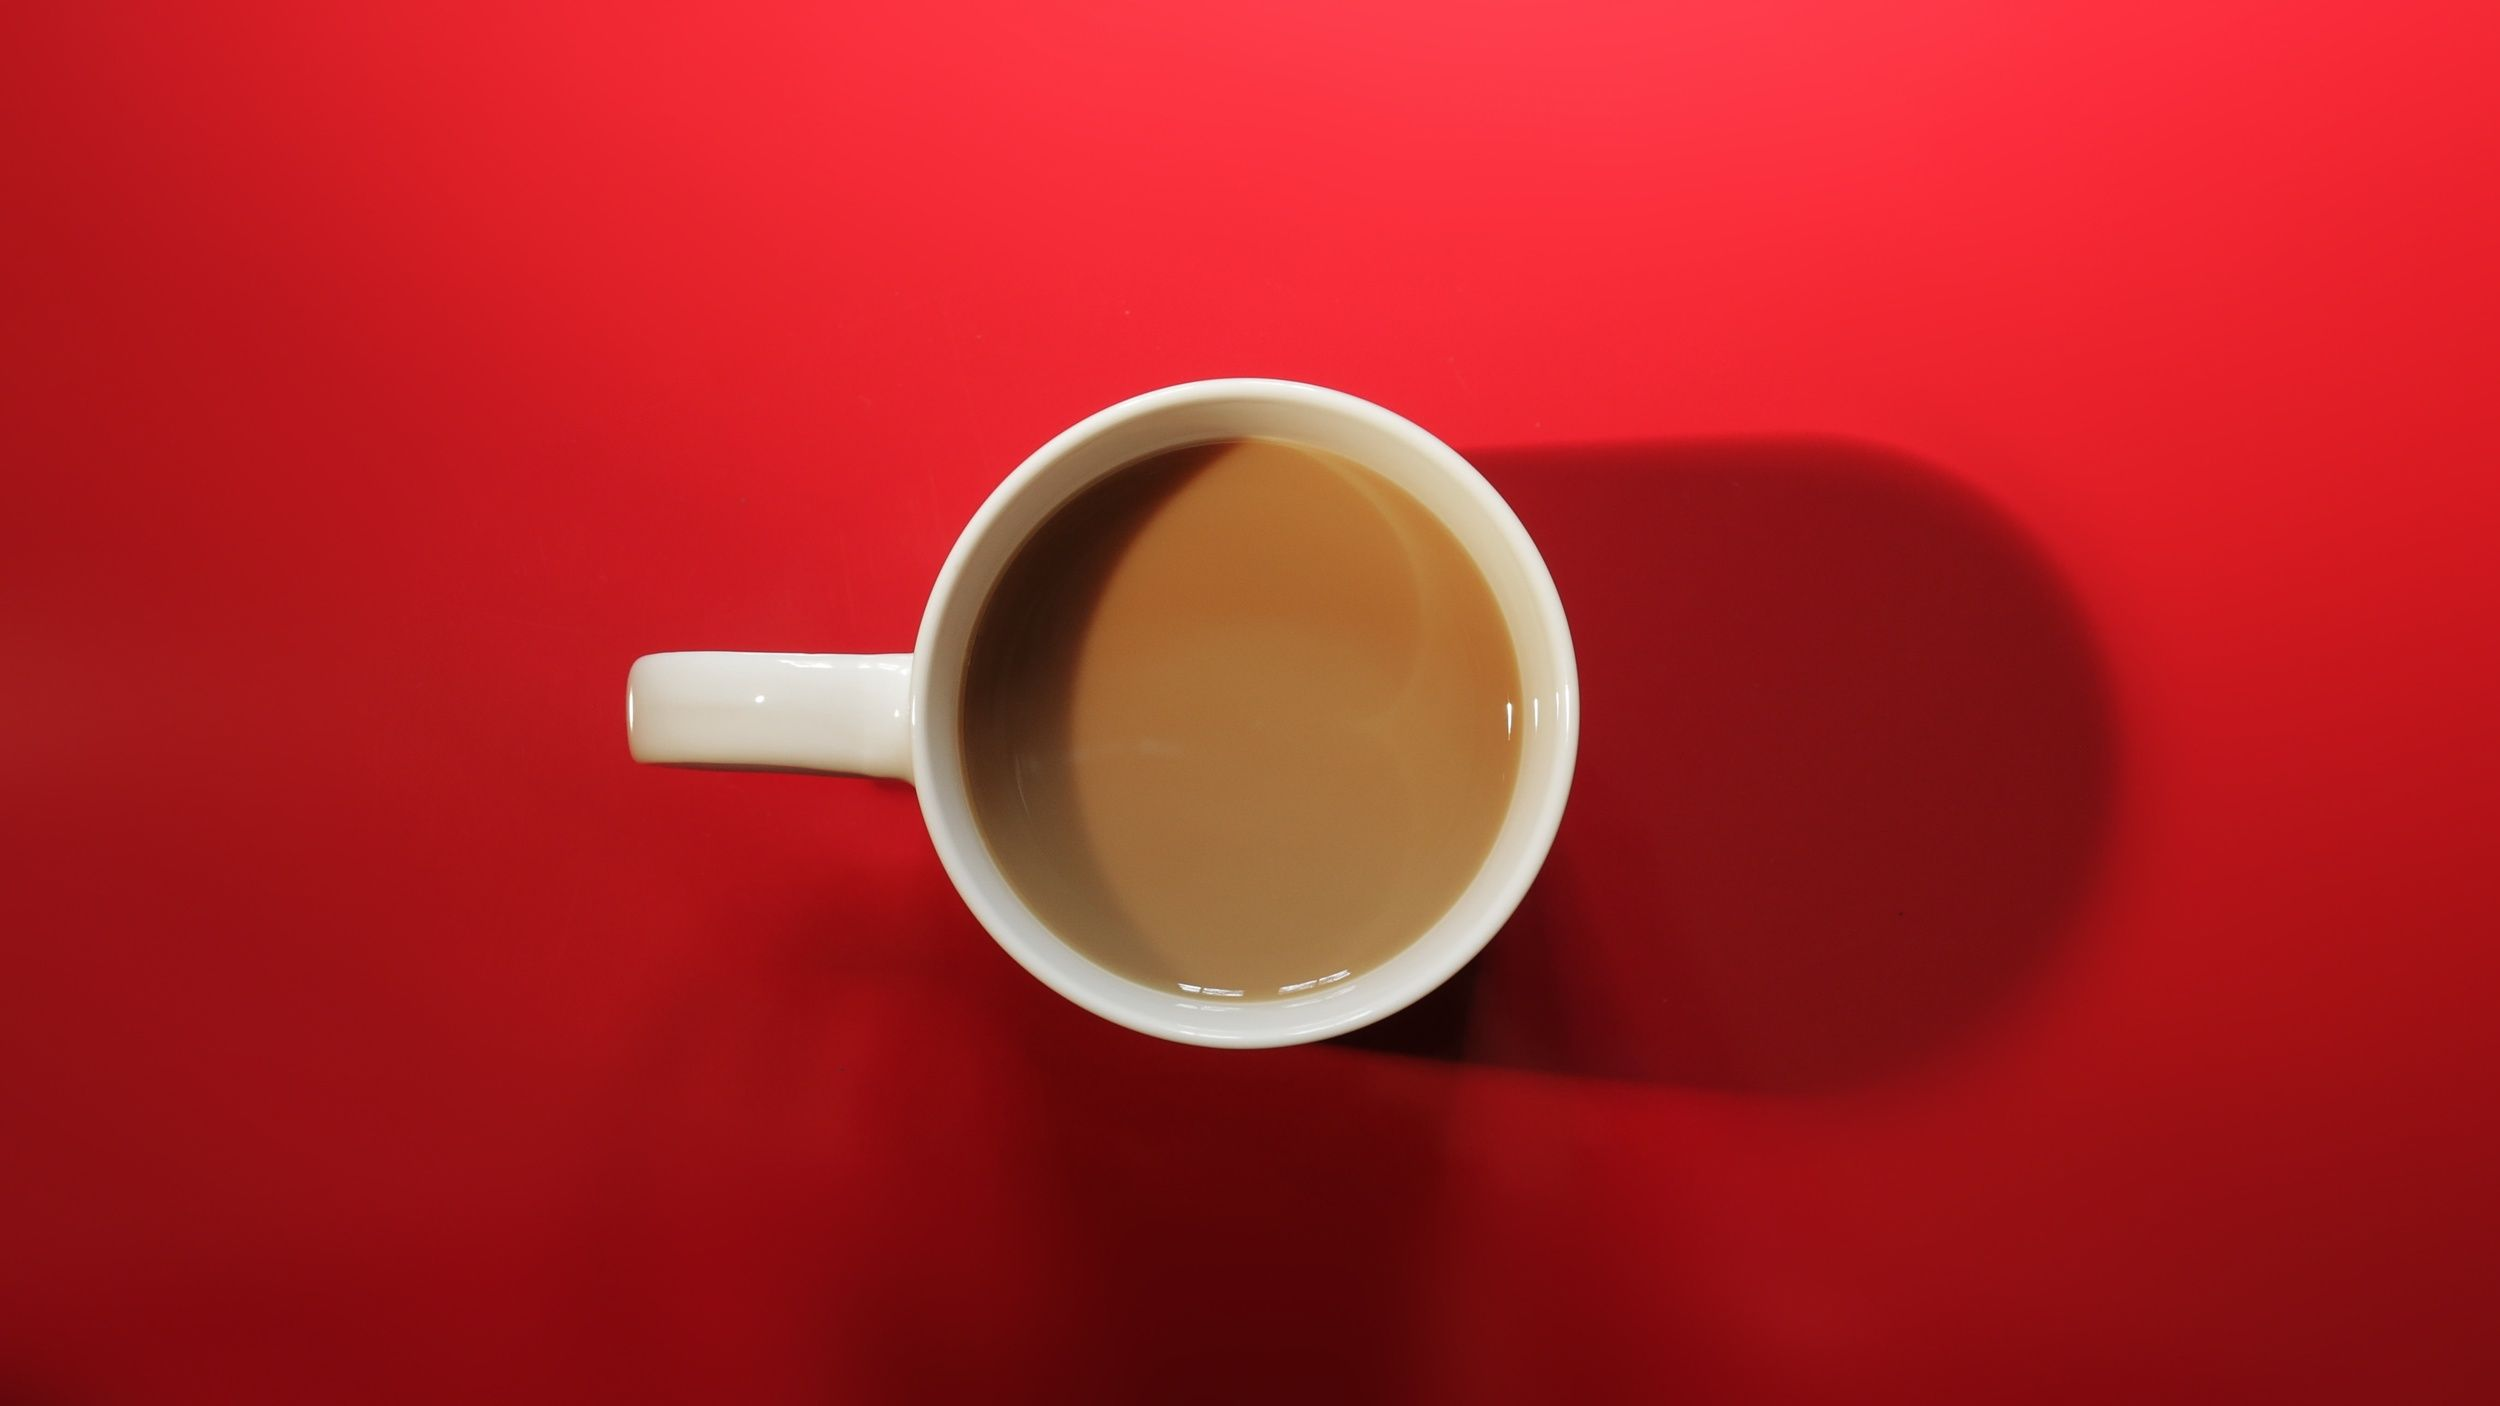 Giver's Gain Coffee, Local coffee shop, Mugs